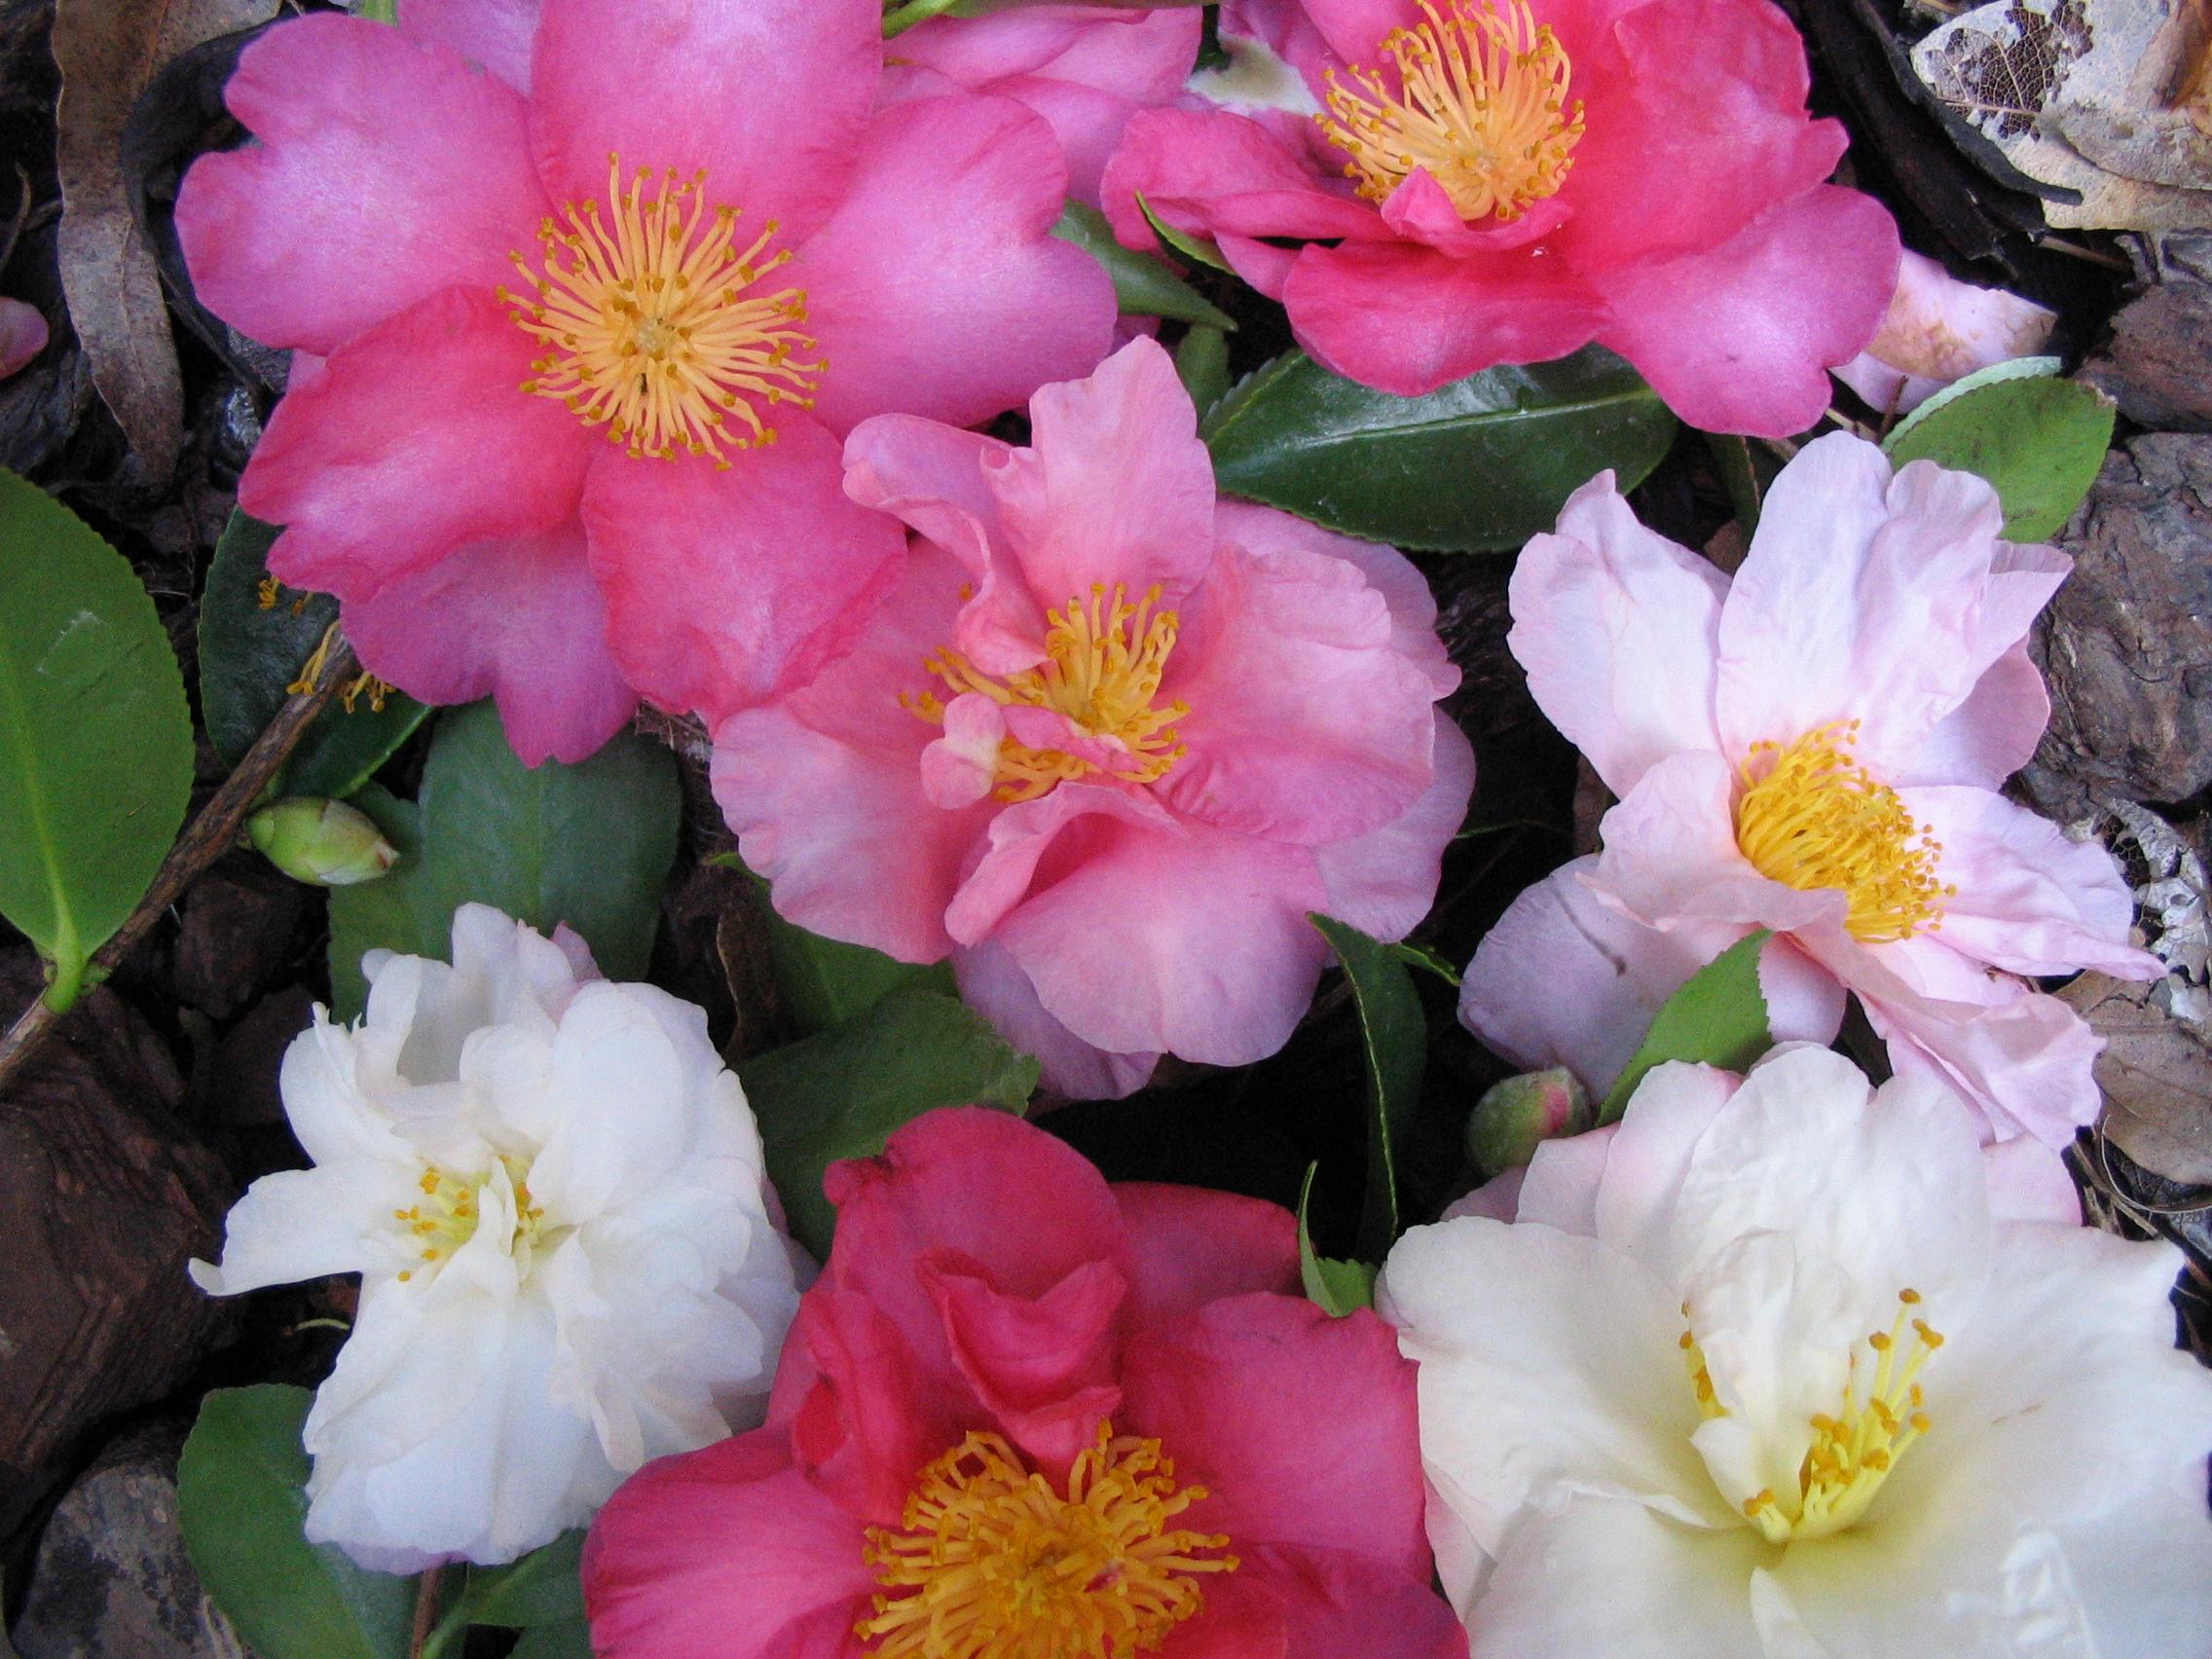 Autumn planting dawsons garden world for Camellia sasanqua